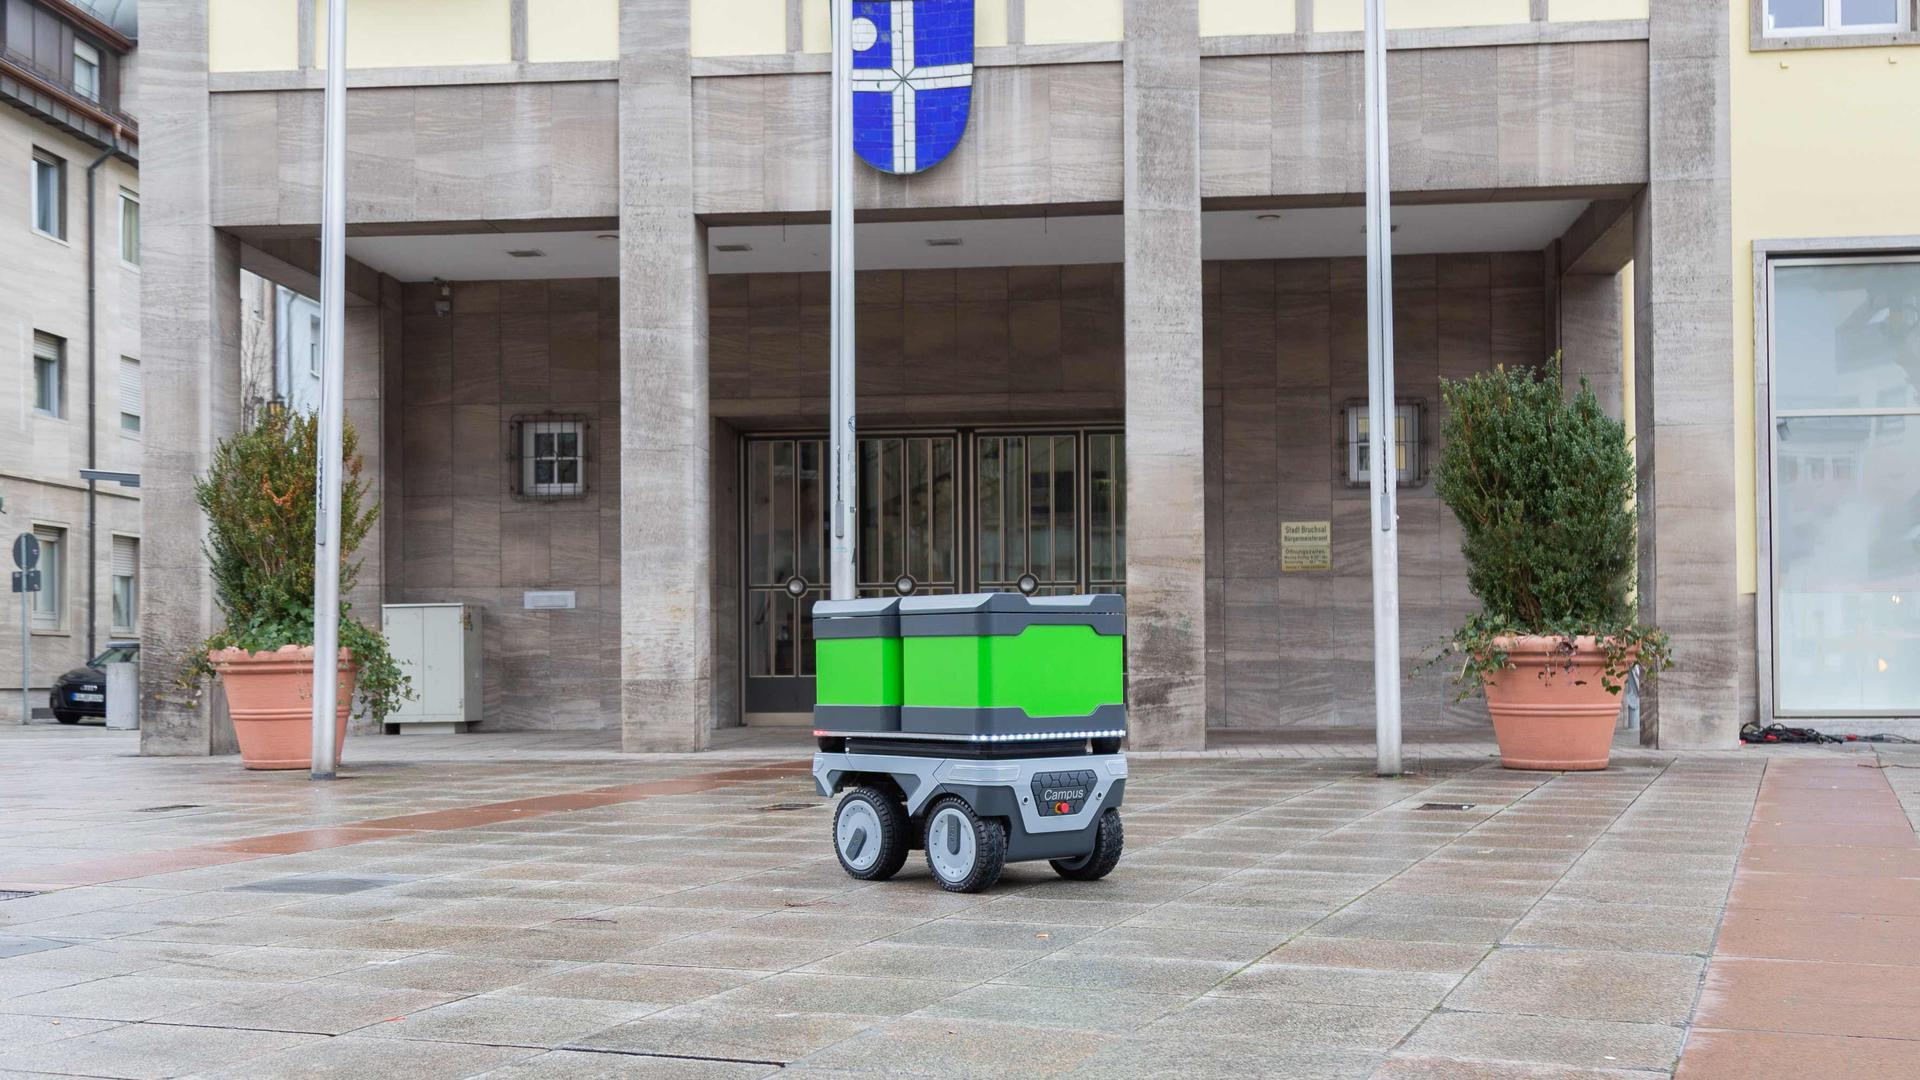 Efeu-Campus Lieferroboter Prototyp Bruchsal